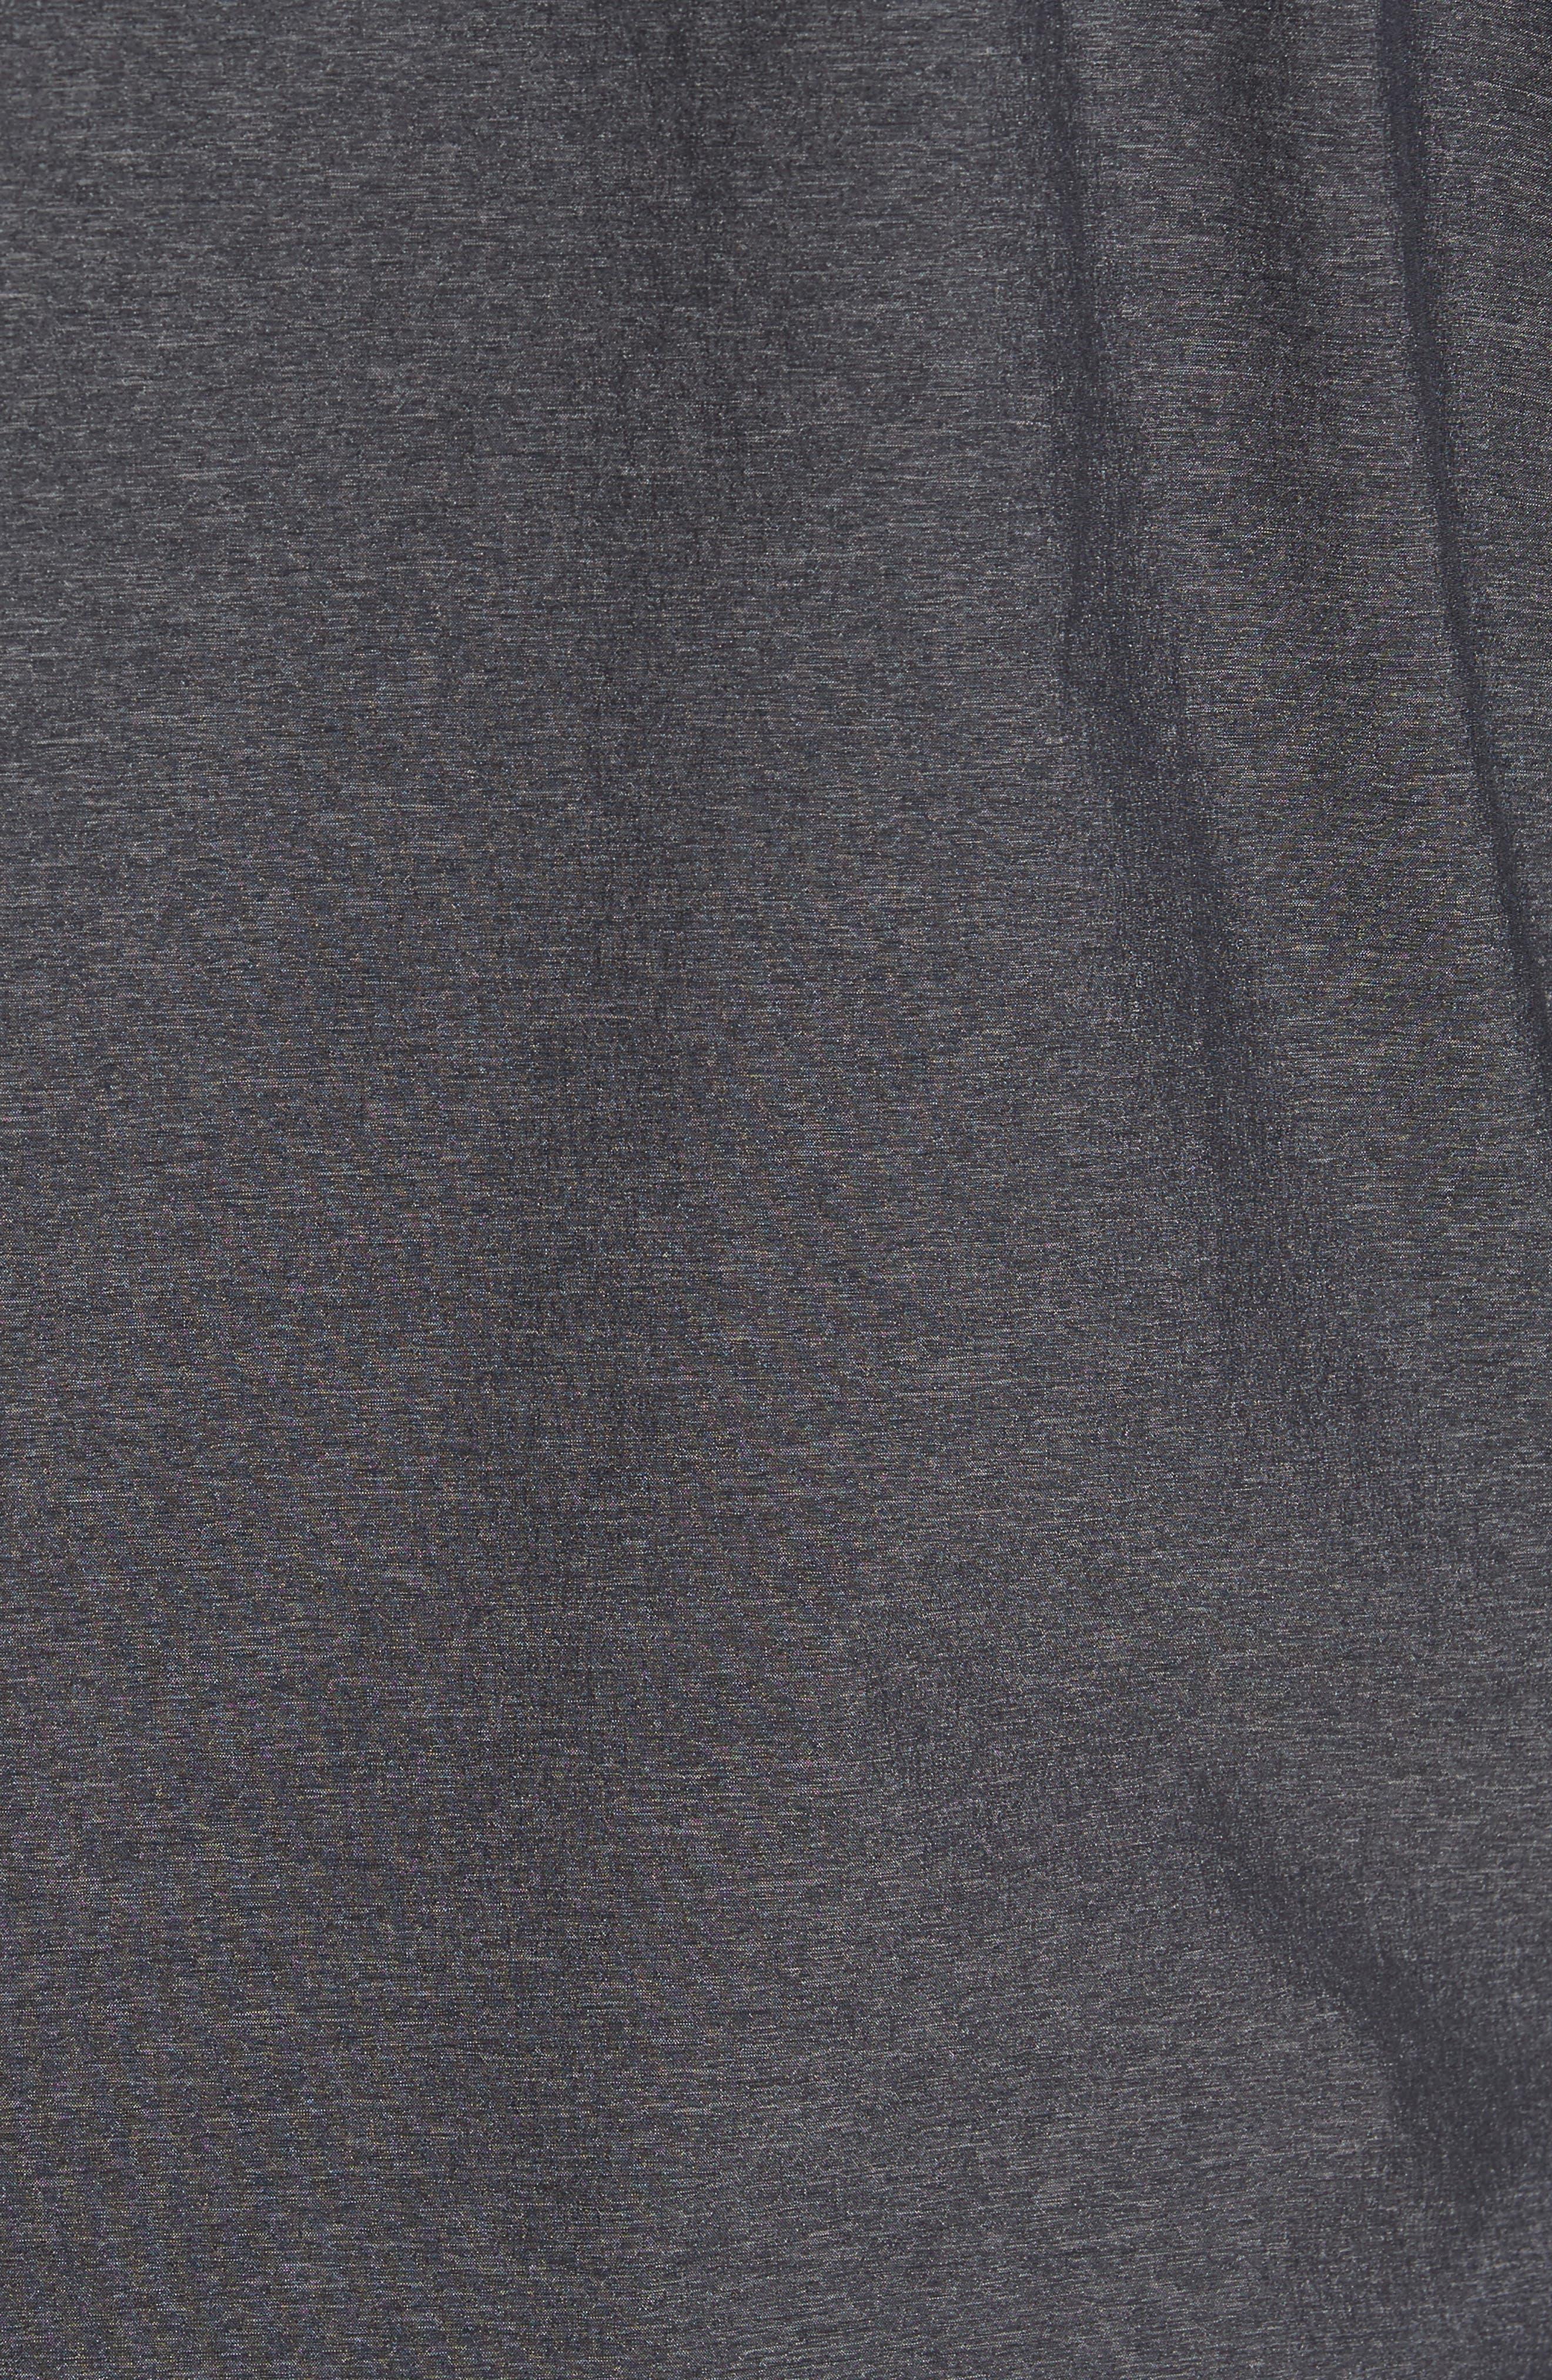 Knit & Woven Hoodie,                             Alternate thumbnail 5, color,                             Grey Ebony - Black